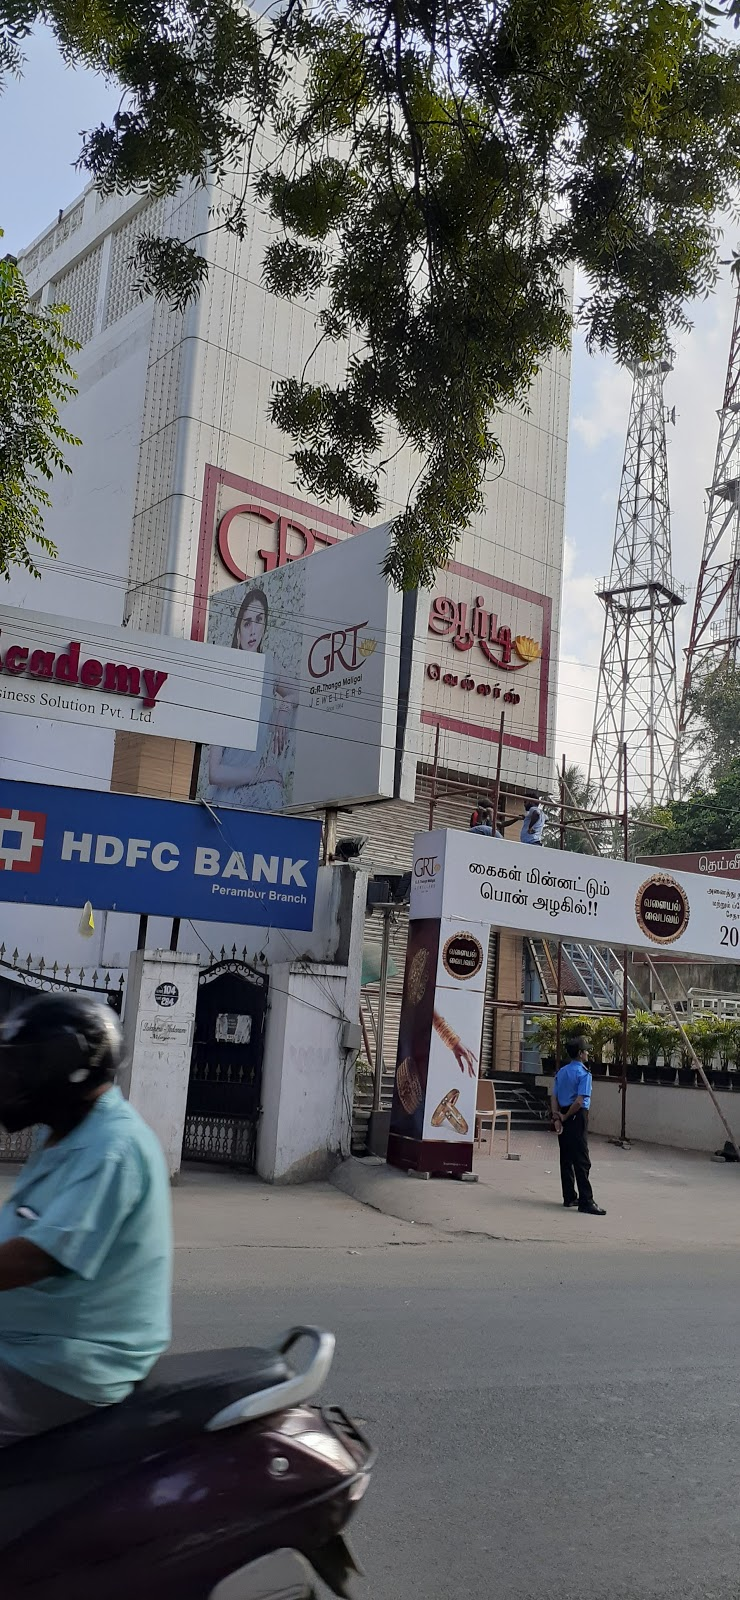 blood bank HDFC Bank near Chennai Tamil Nadu